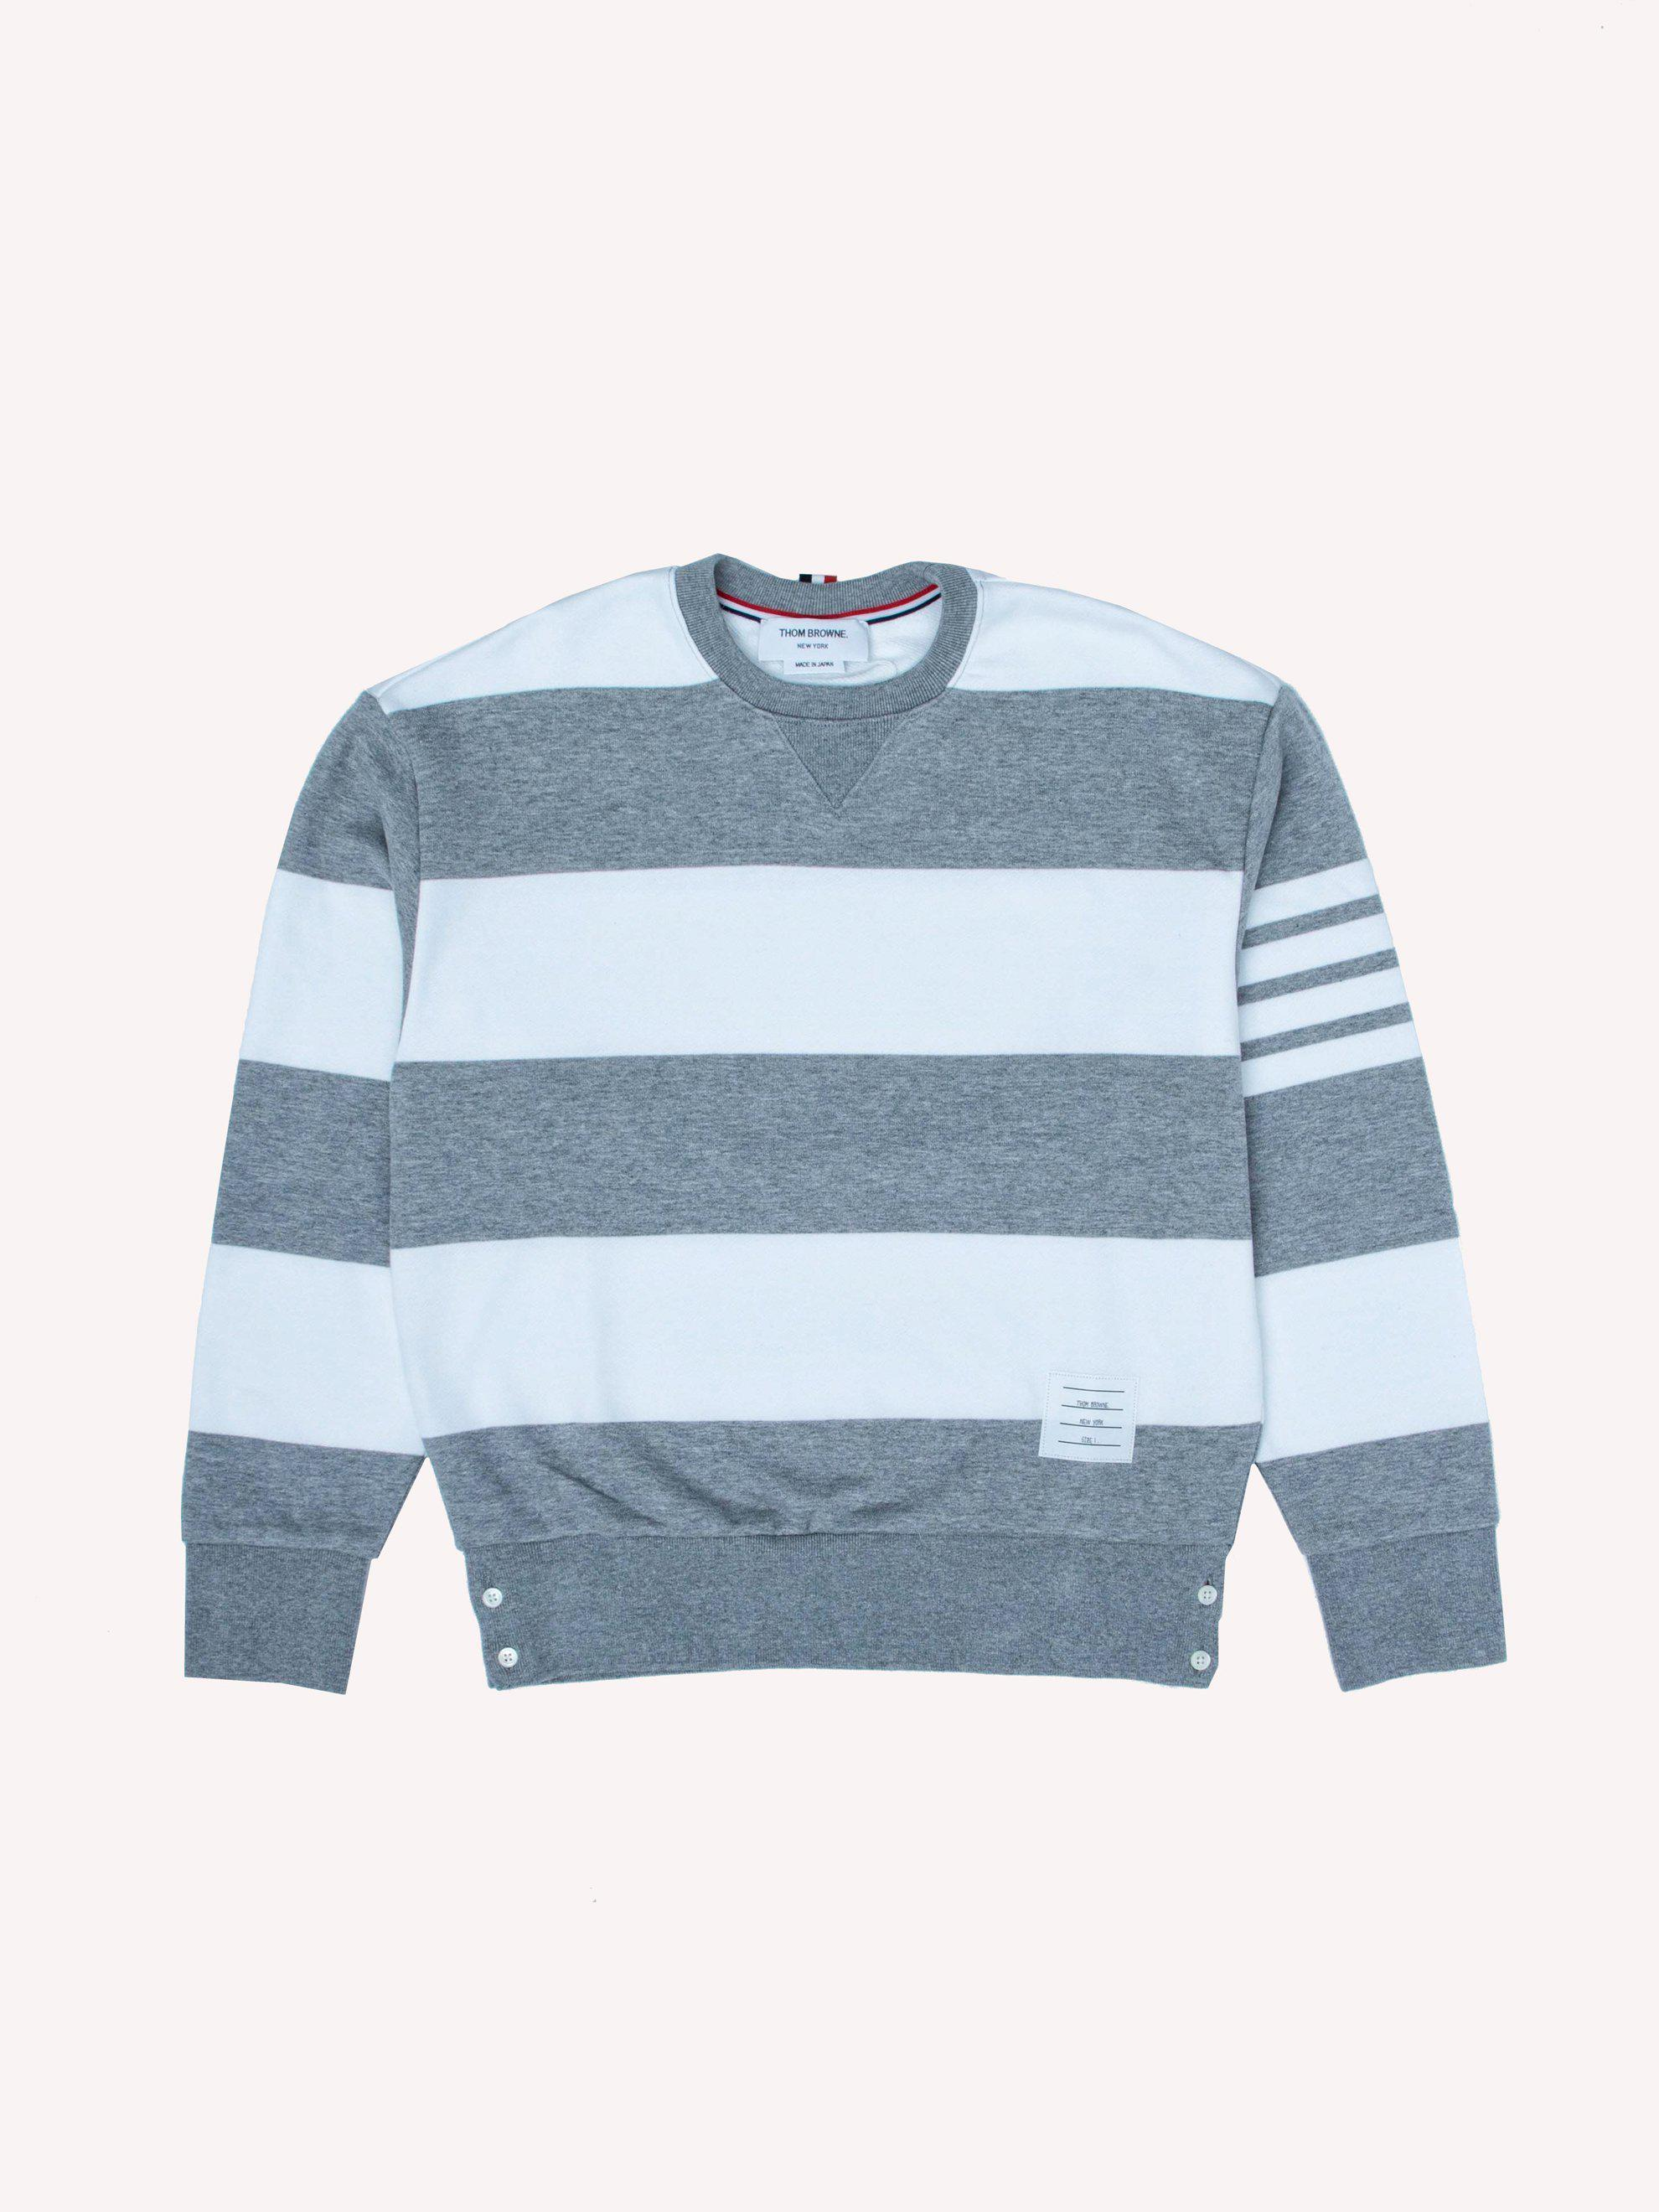 551170c8151 Lyst - Thom Browne Drop Shoulder Crewneck Sweatshirt in Gray for Men